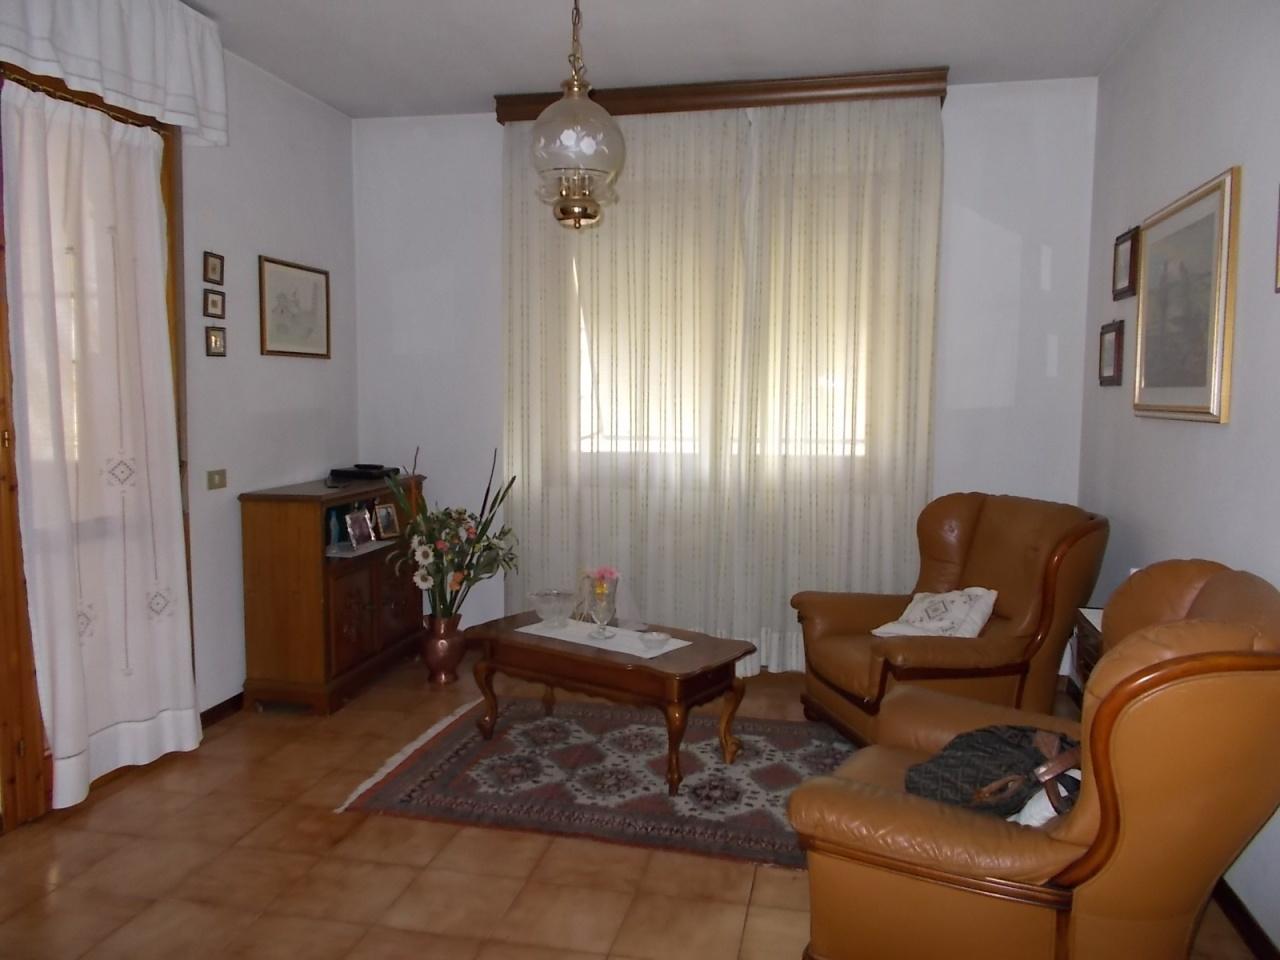 Immobile a Serravalle Pistoiese